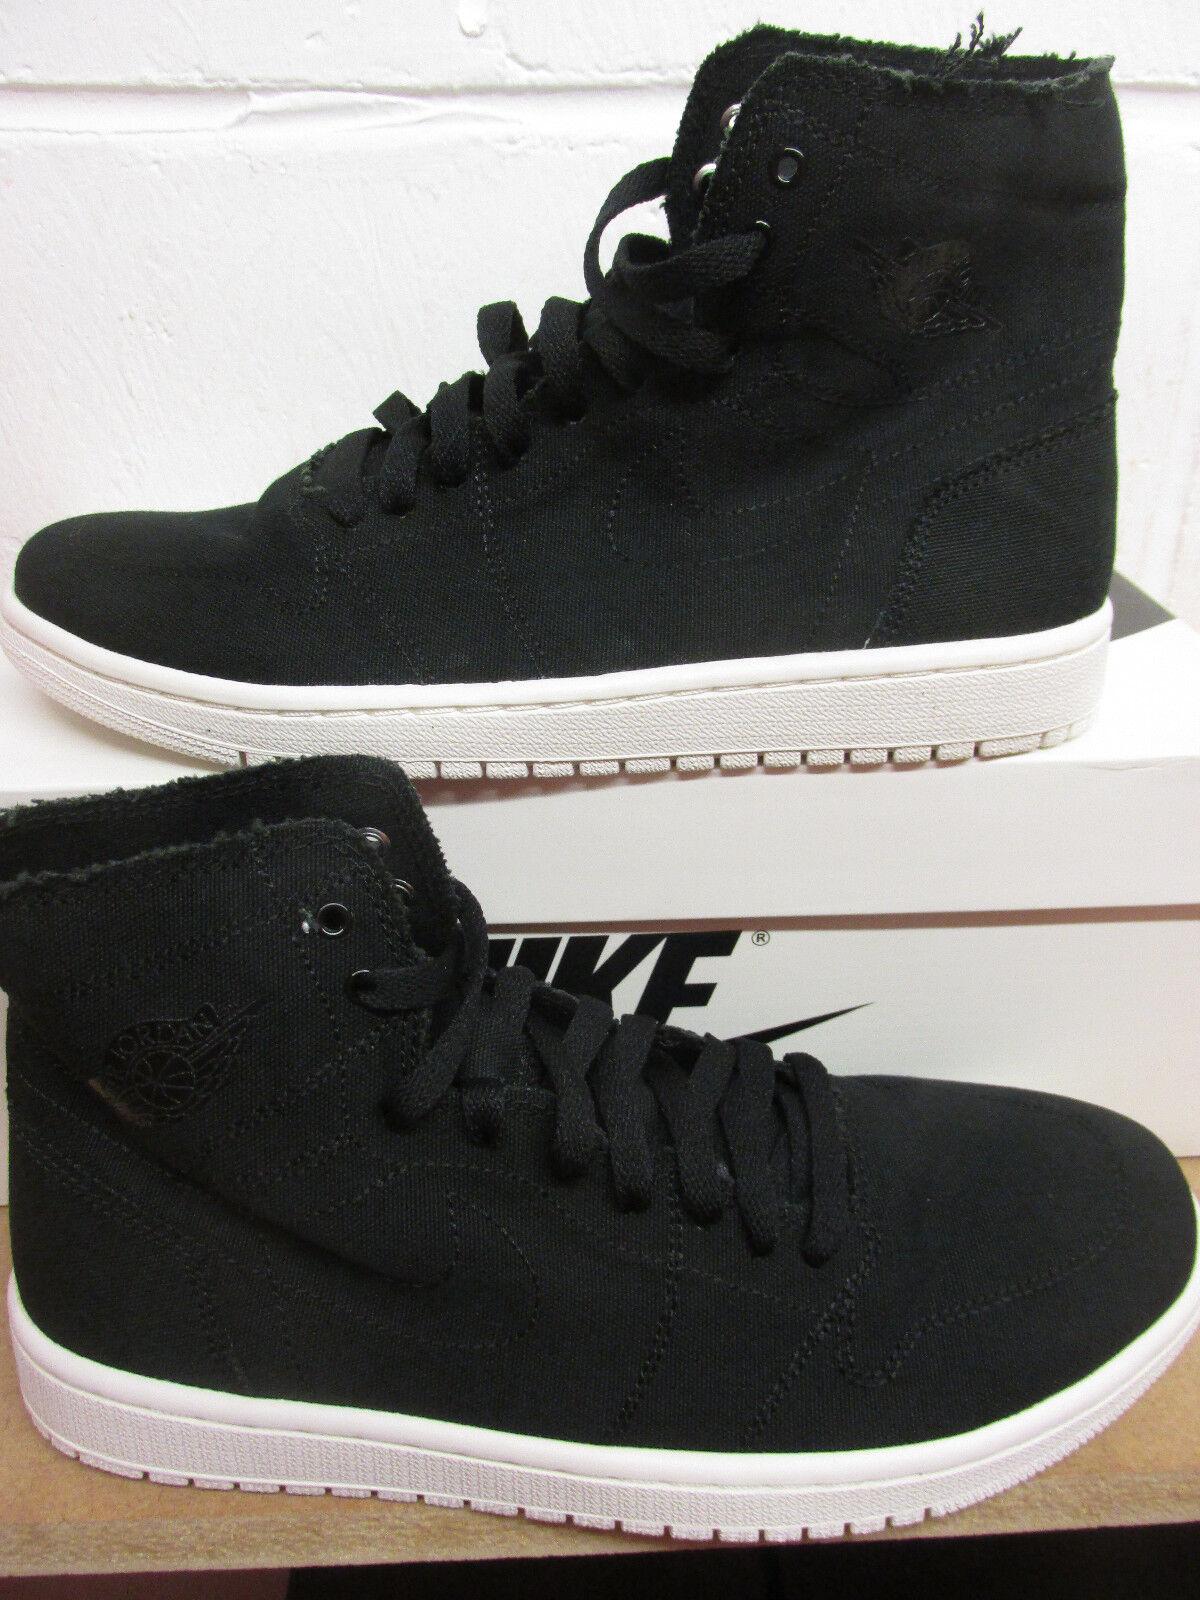 Nike air jordan 1 'alto decontaminazione basket formatori 867338 010 scarpe scarpa